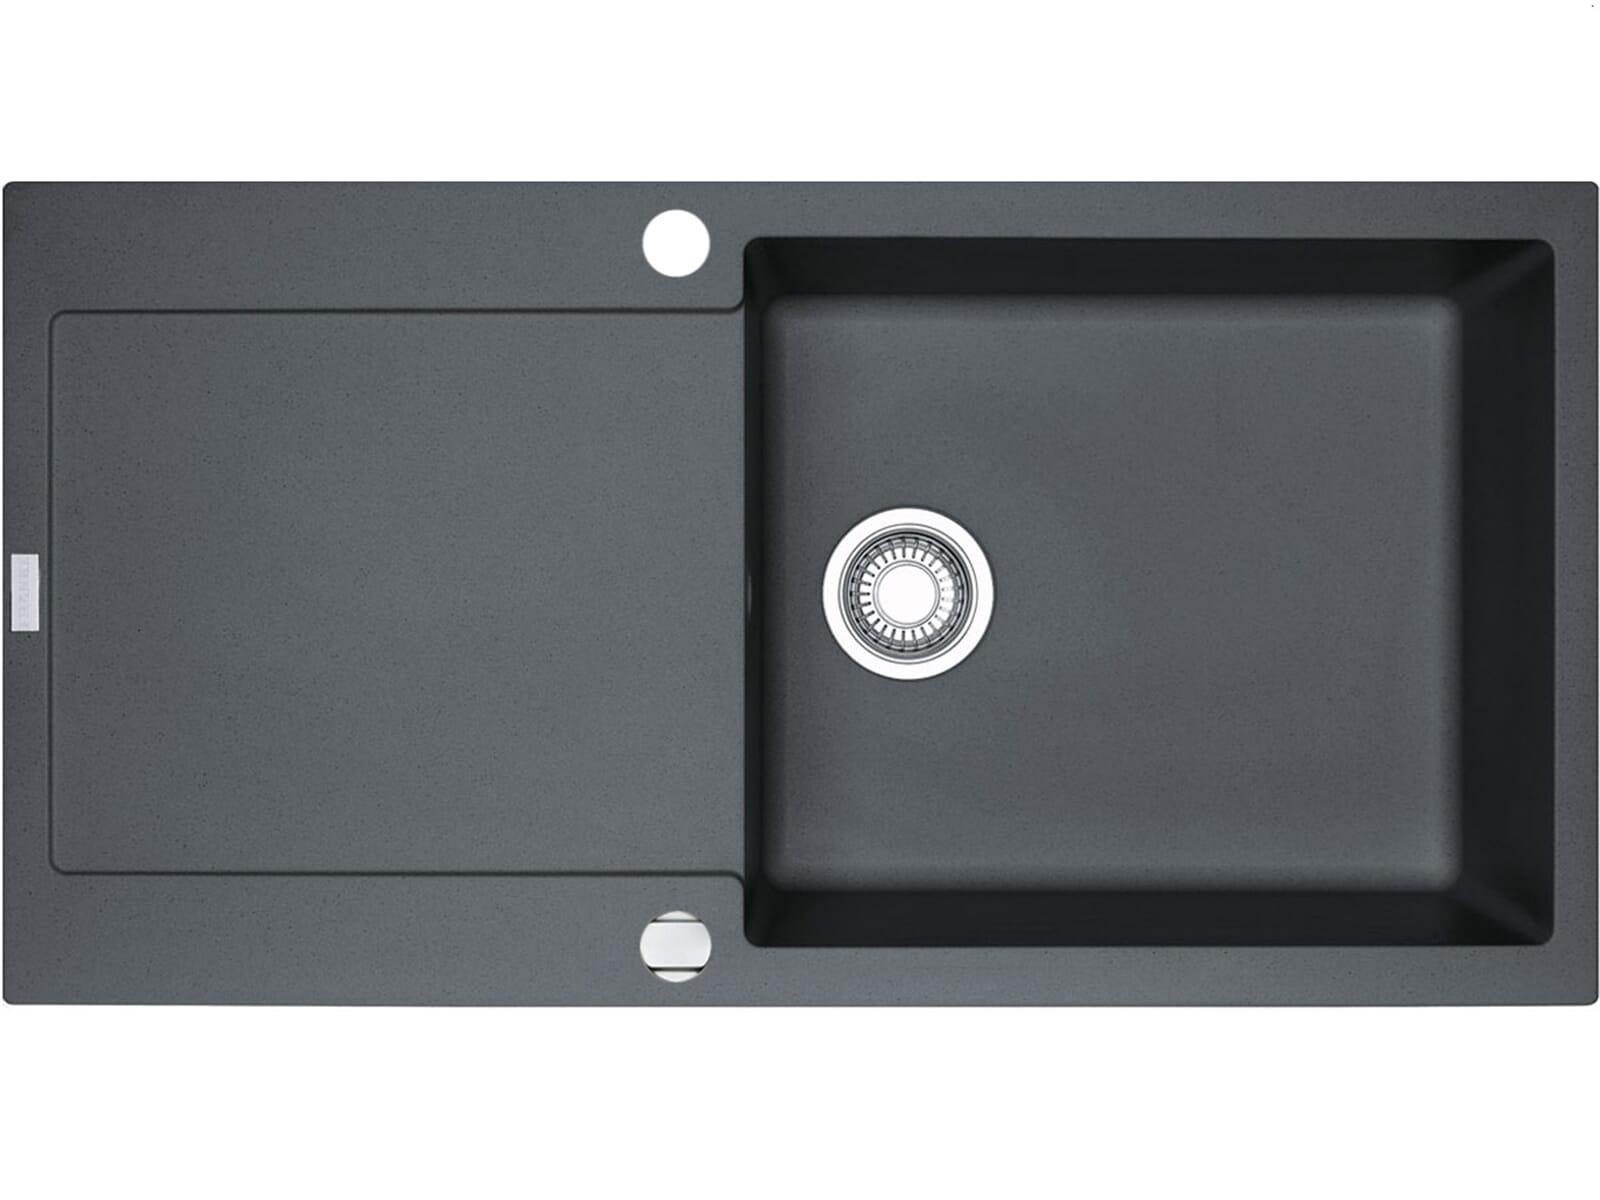 franke maris mrg 611 100 xl graphit grau granit sp ltisch m hlau bei chemnitz. Black Bedroom Furniture Sets. Home Design Ideas